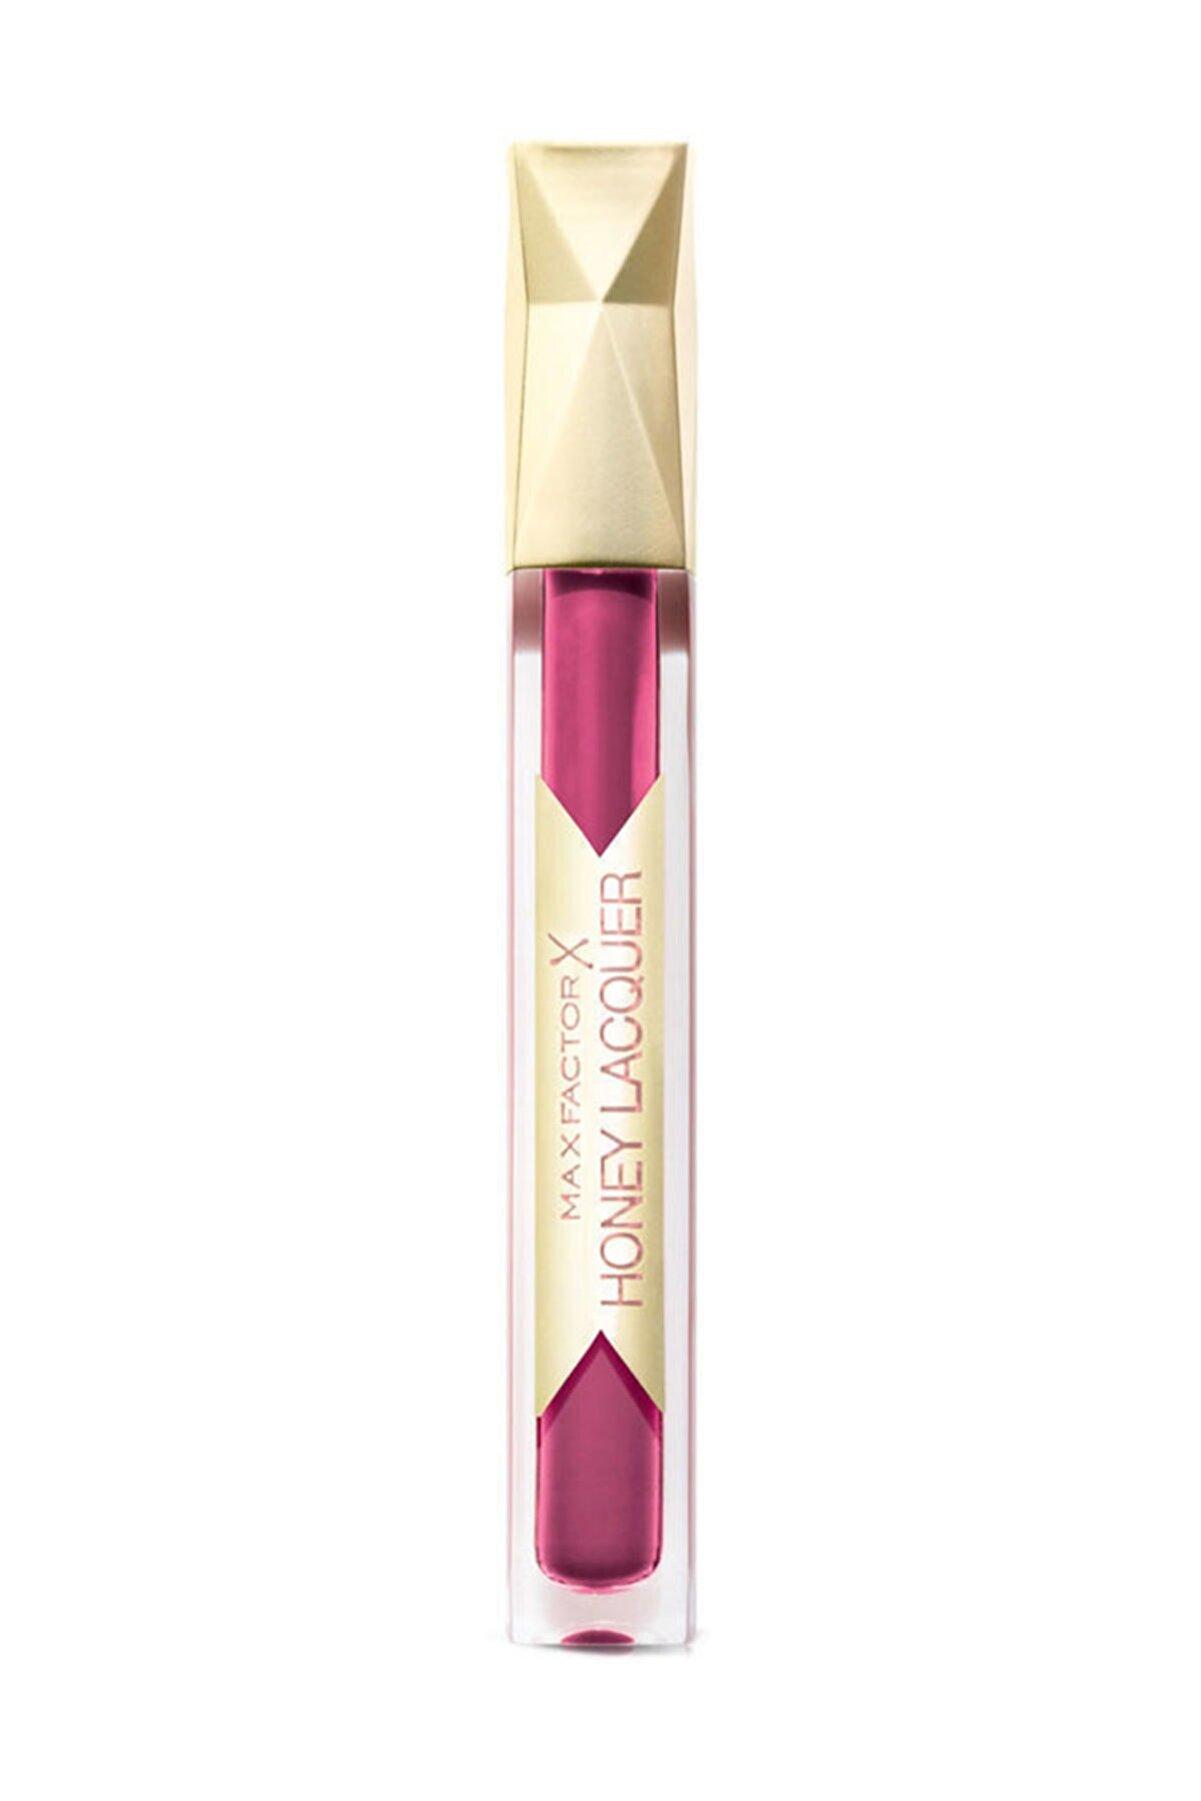 Max Factor Dudak Parlatıcısı - Honey Lacquer Gloss 35 Bloom Berry 8005610434209